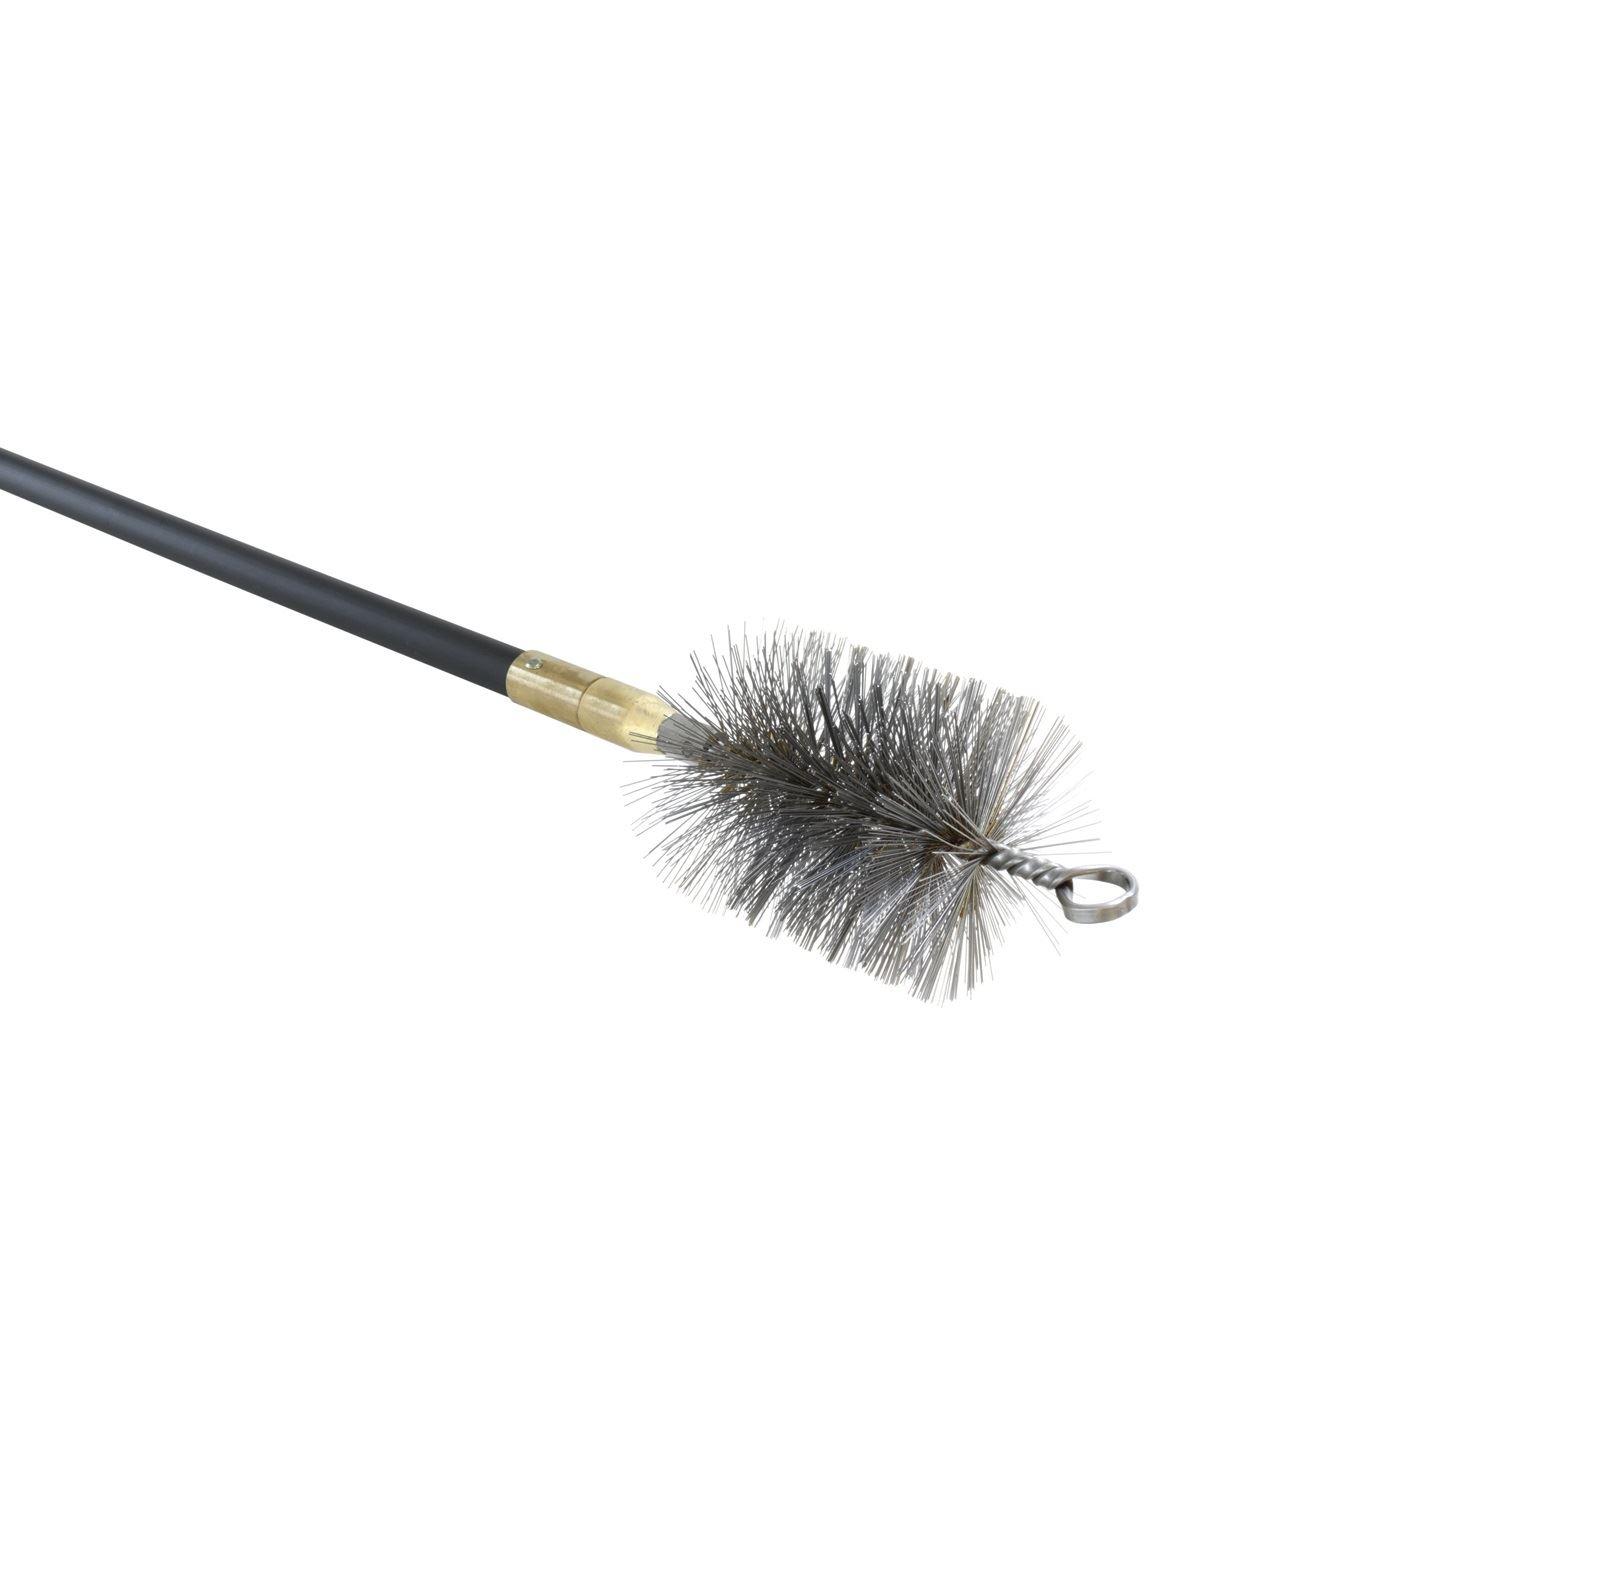 4 inch wire chimney brush